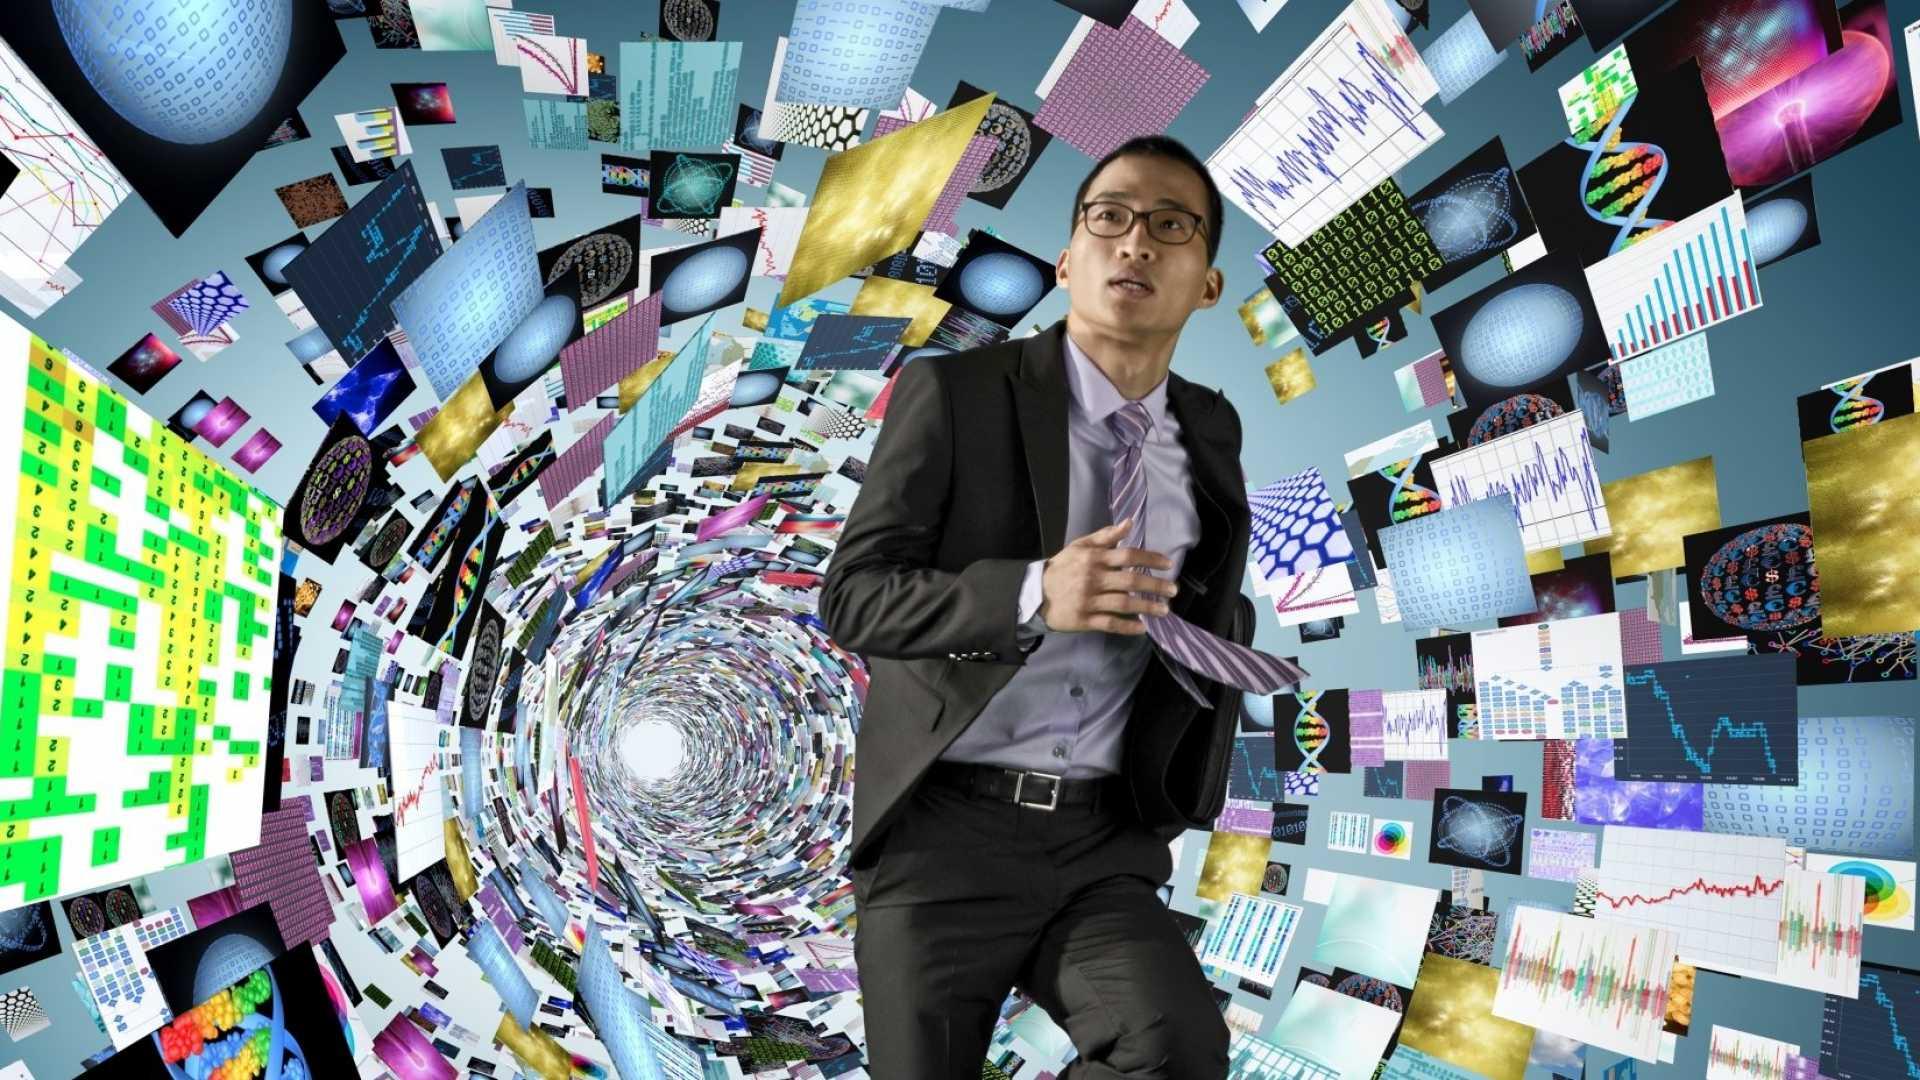 Entrepreneurs Should Avoid the Internet of Things